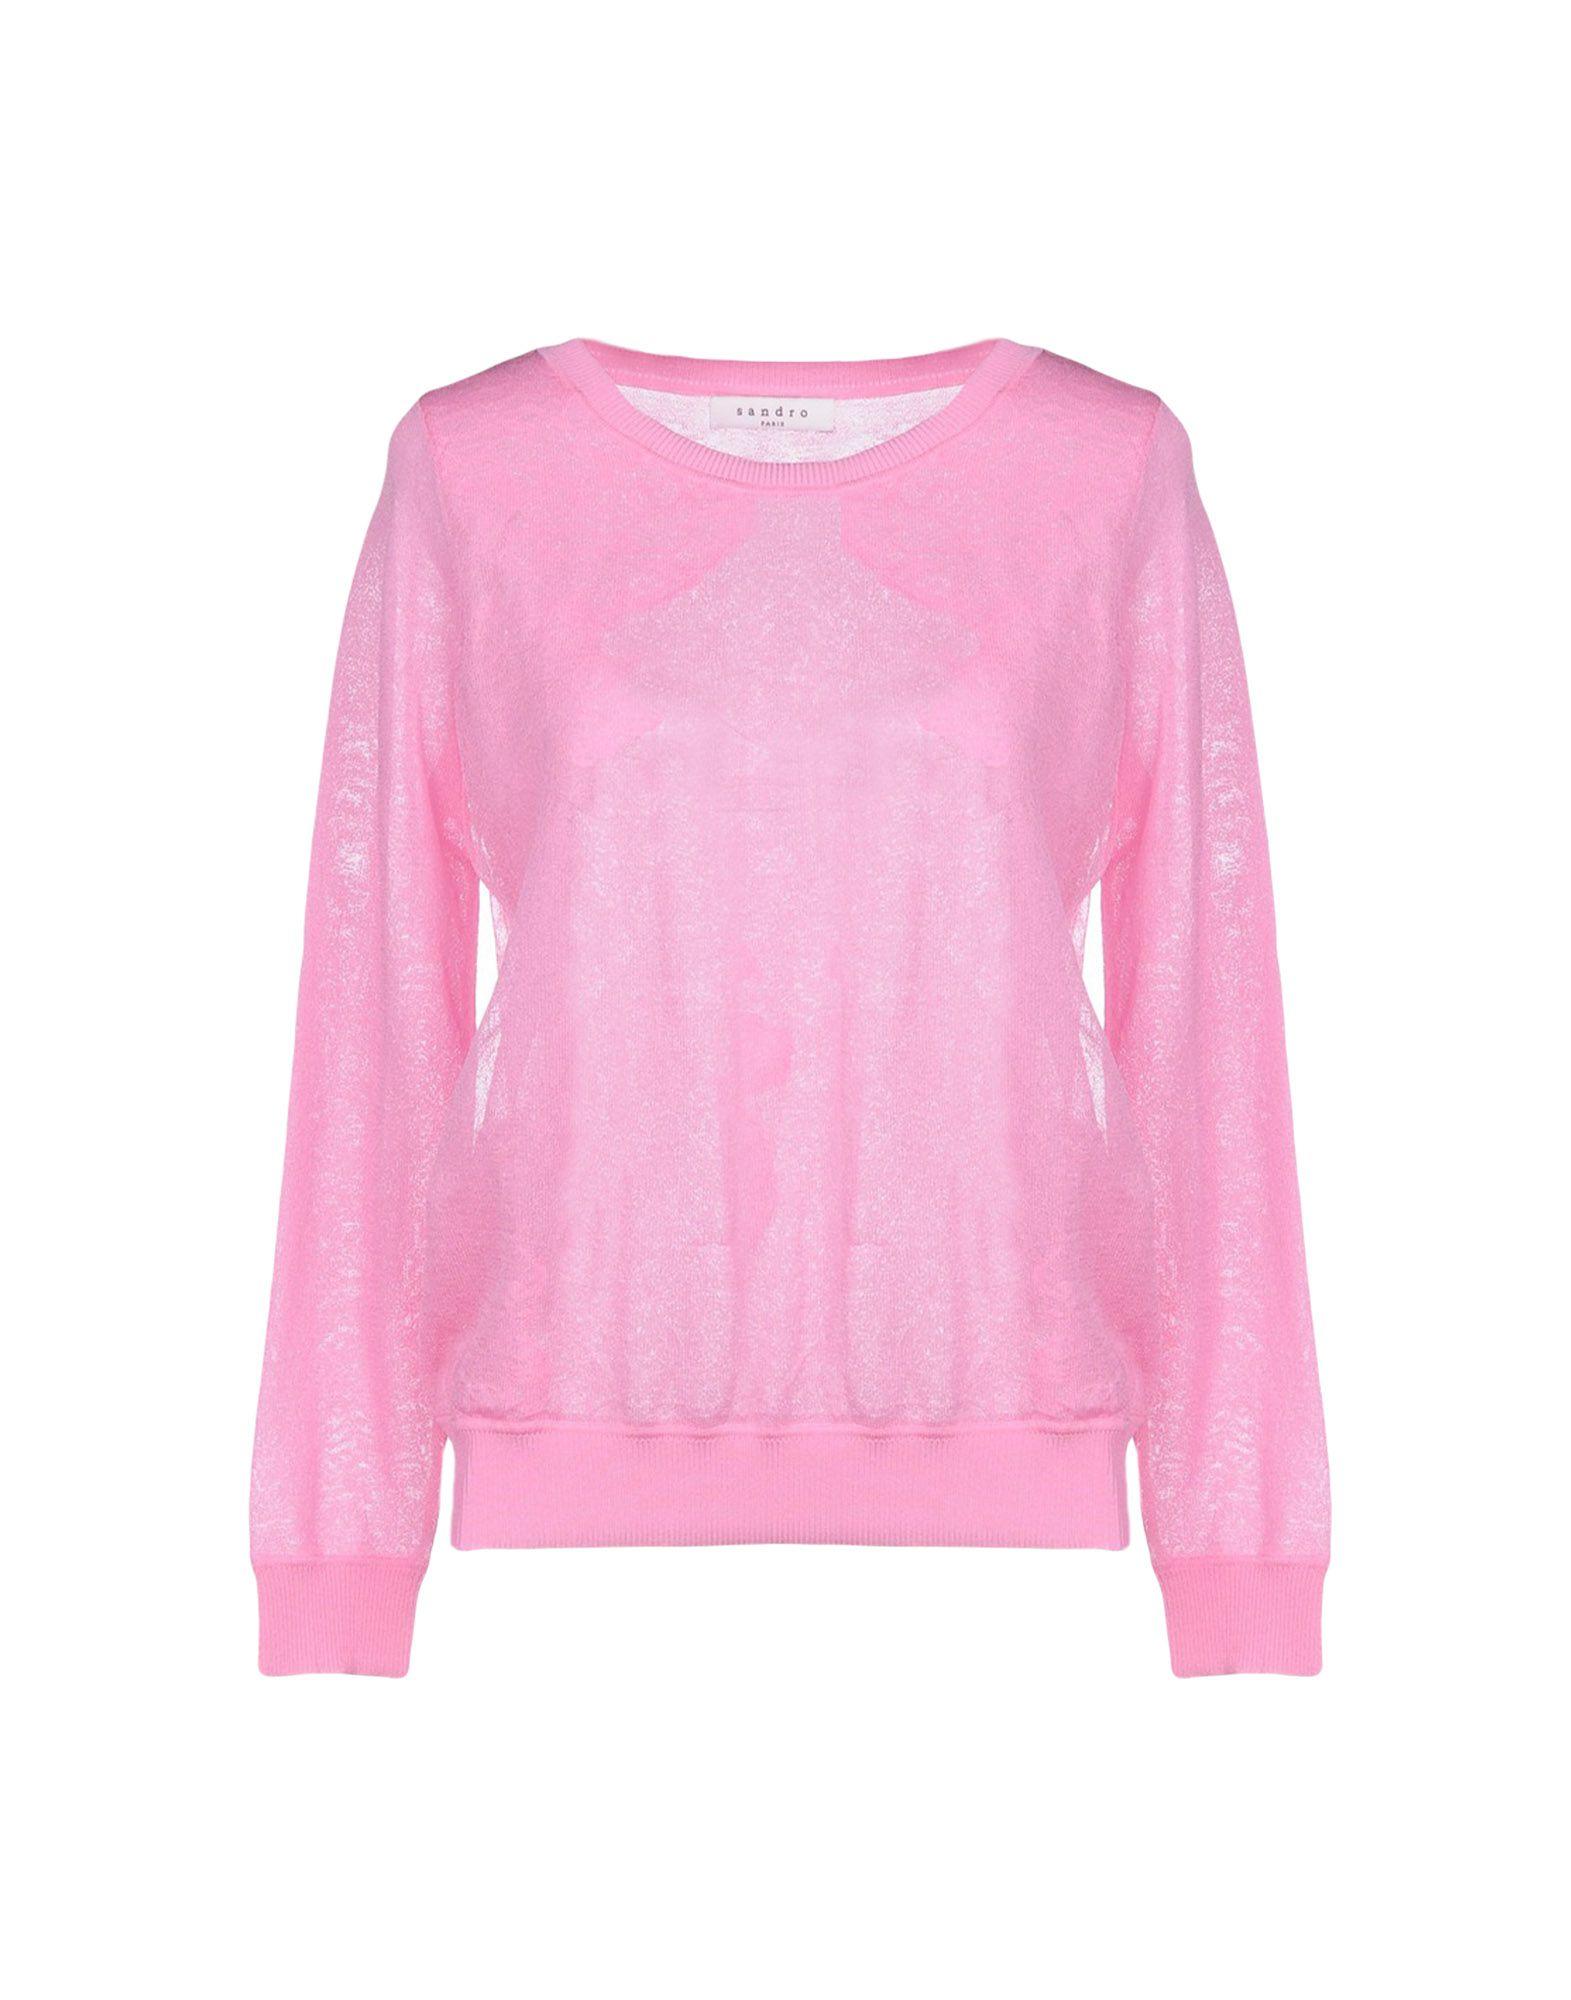 SANDRO PARIS Sweater in Pink